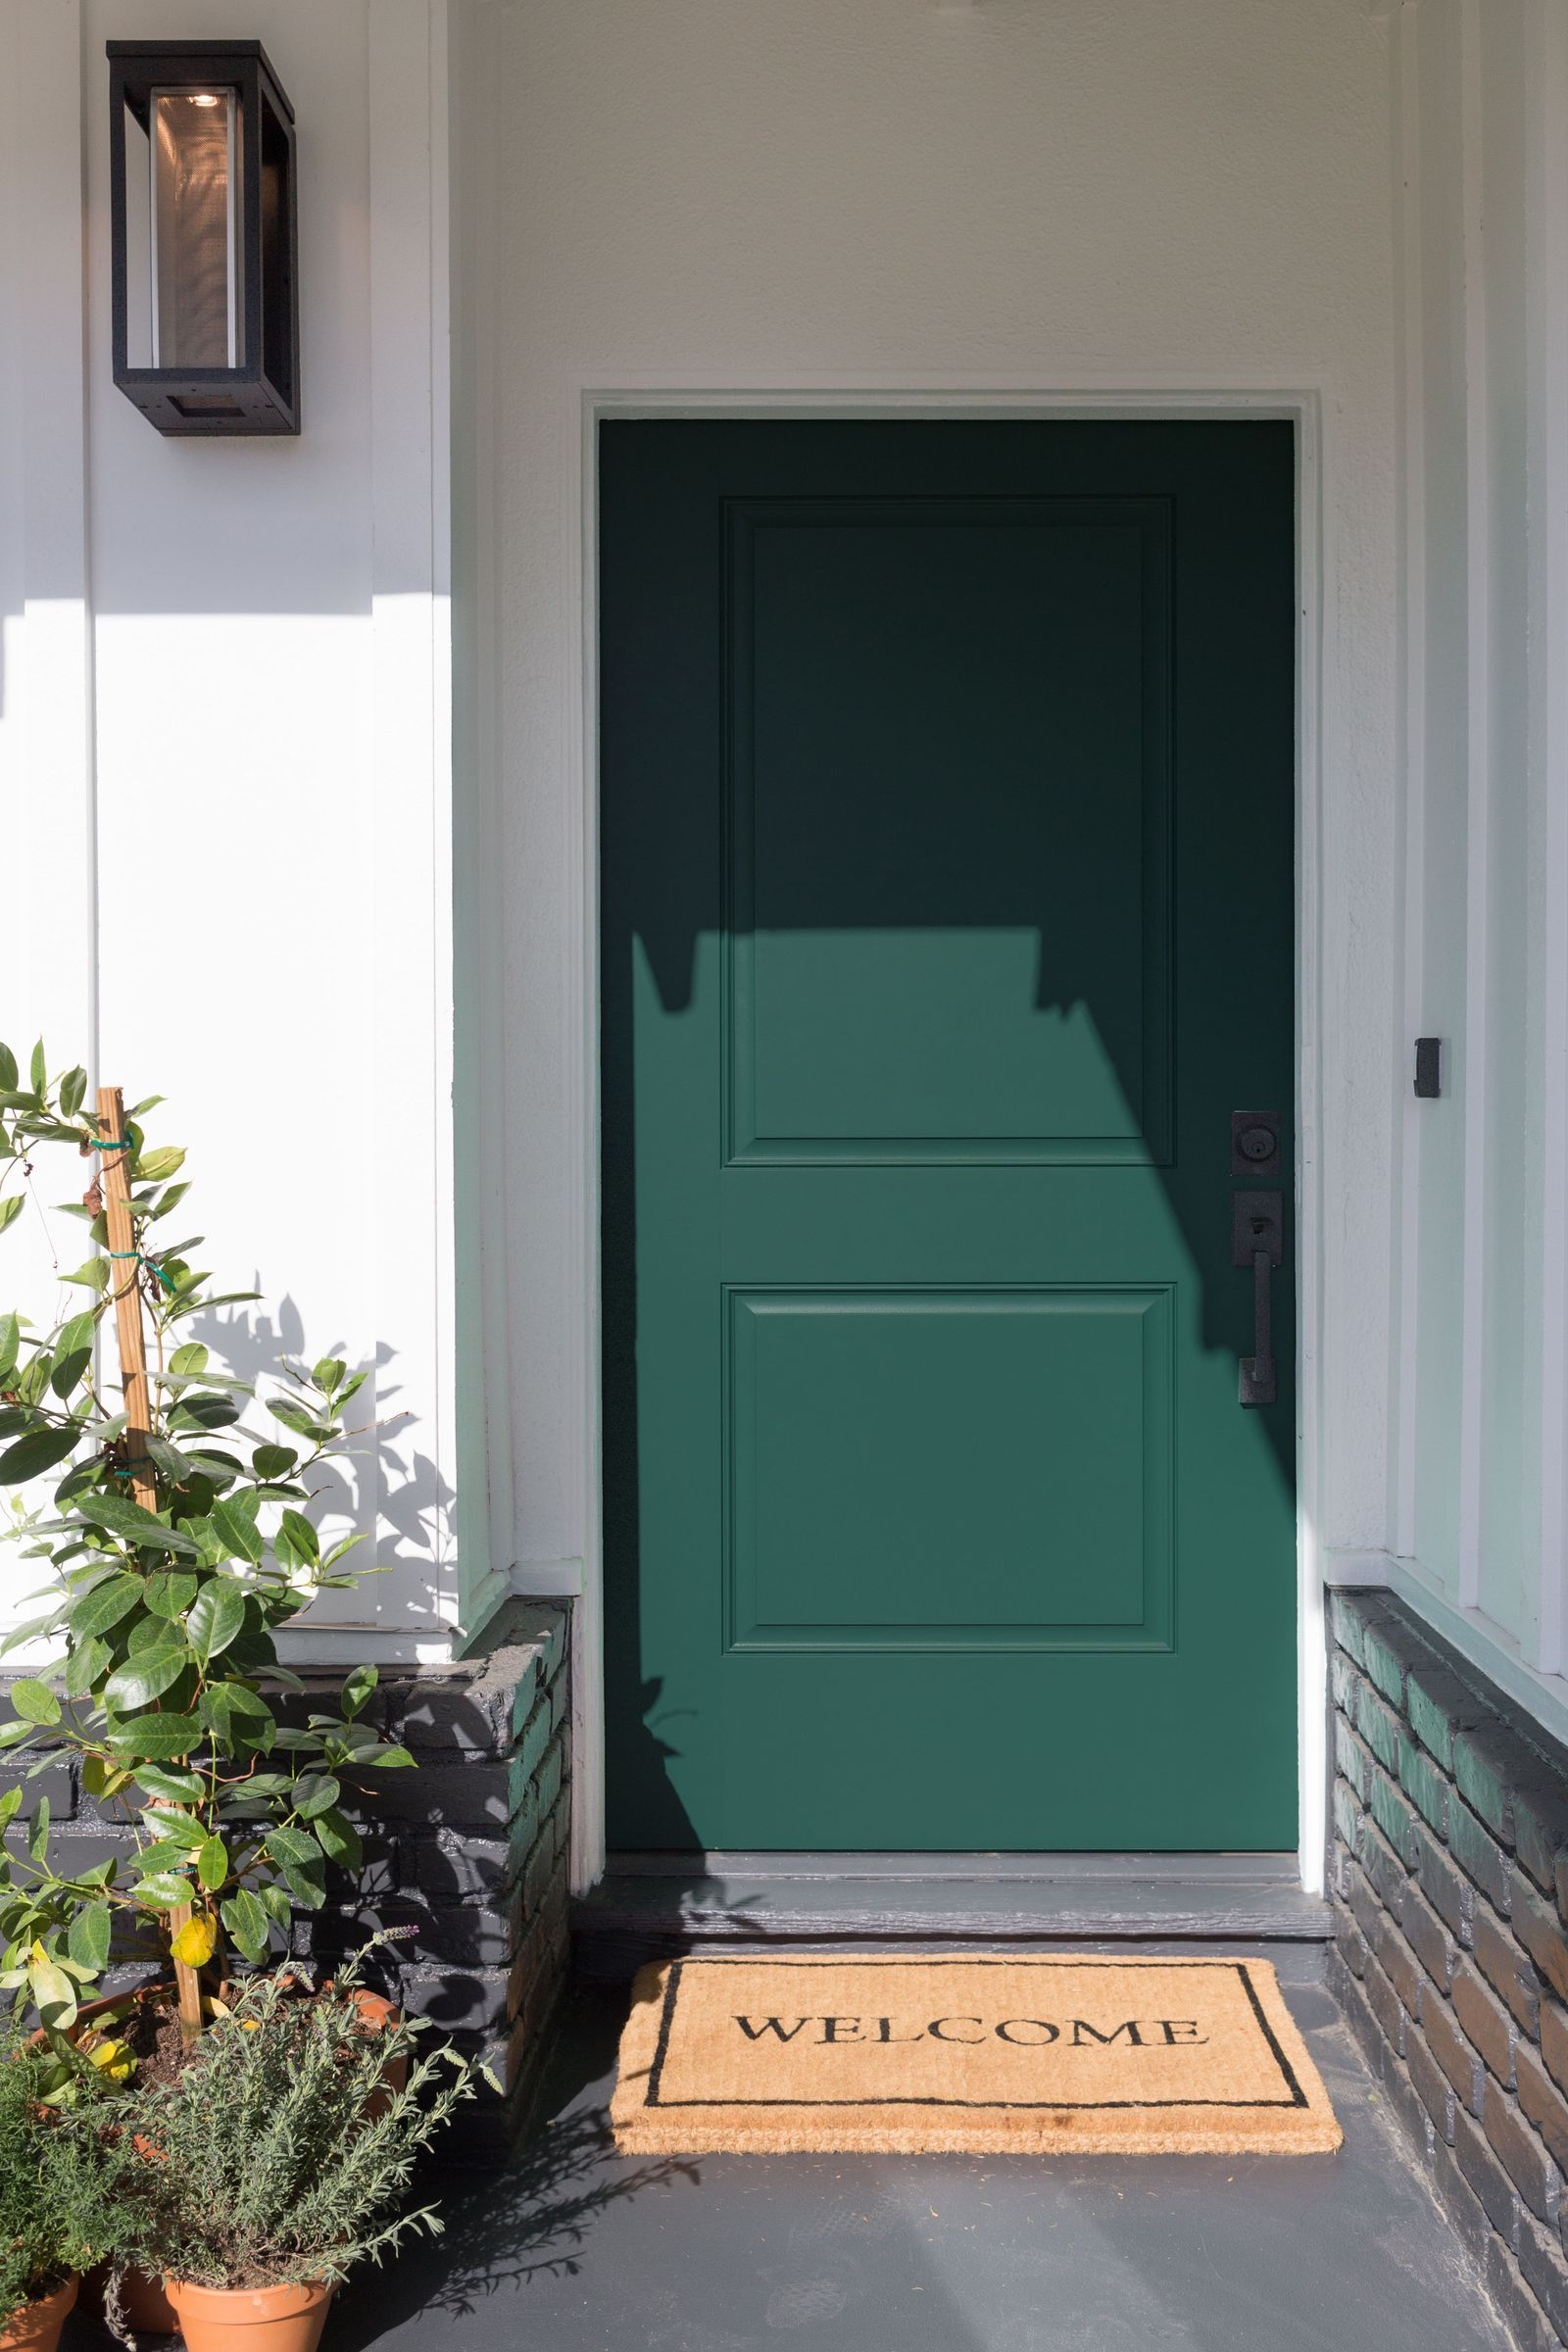 Hgtv S Jasmine Roth On How To Decorate With Night Watch 2019 S It Paint Color Front Door Colors Green Front Doors Door Color